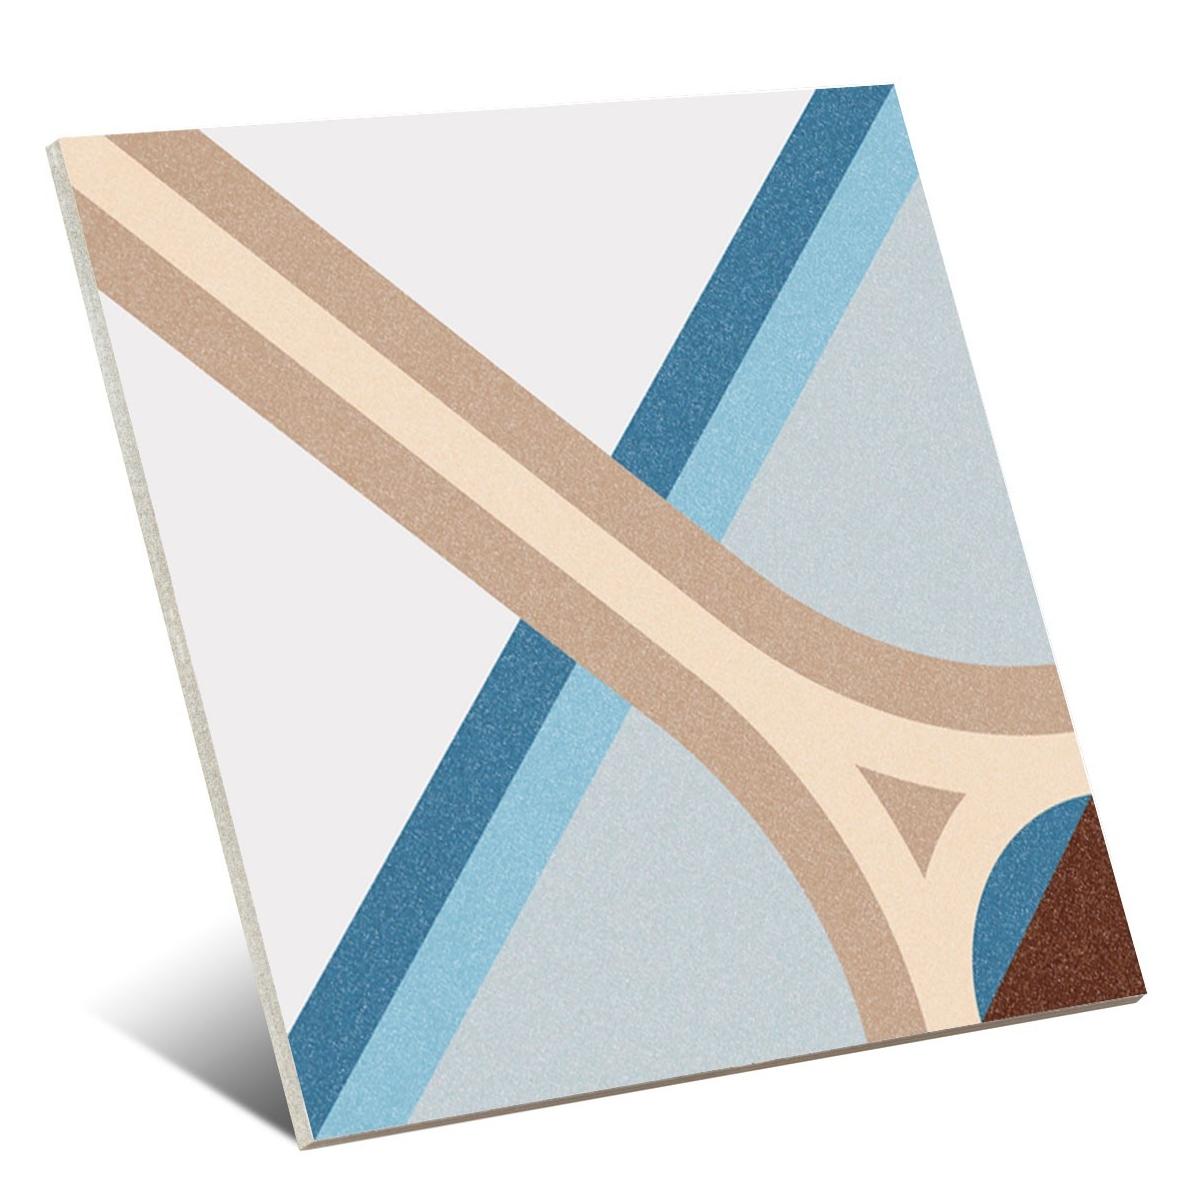 Montaner azul 20x20 (m2) - Valvanera - Marca Vives